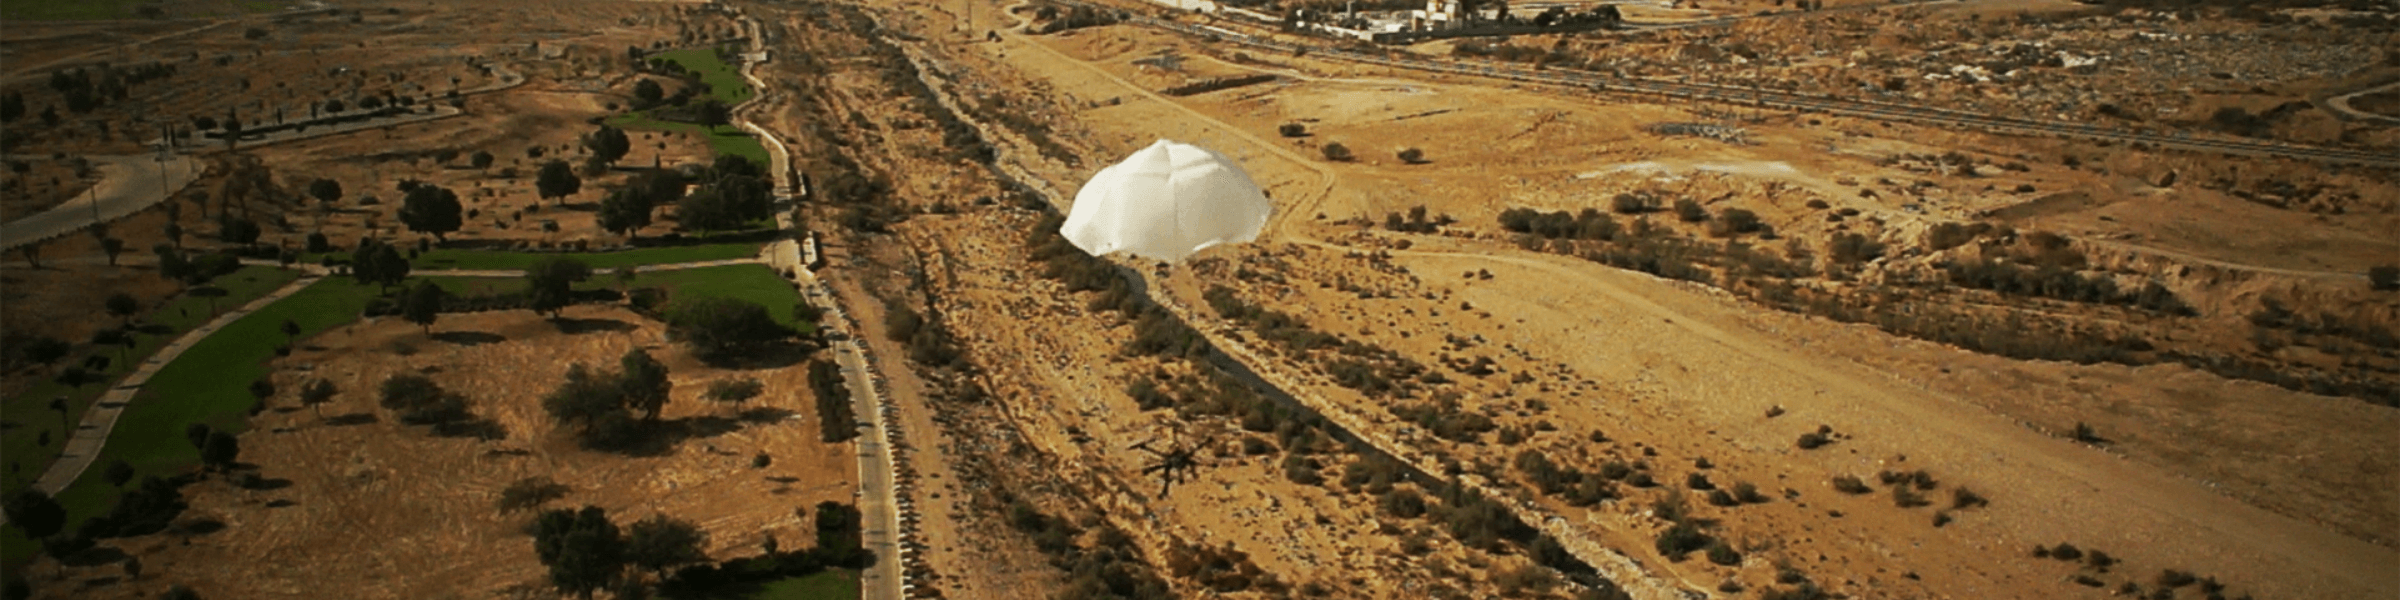 Panazero-Drone-Major-Consultancy-Services-Solutions-Hub